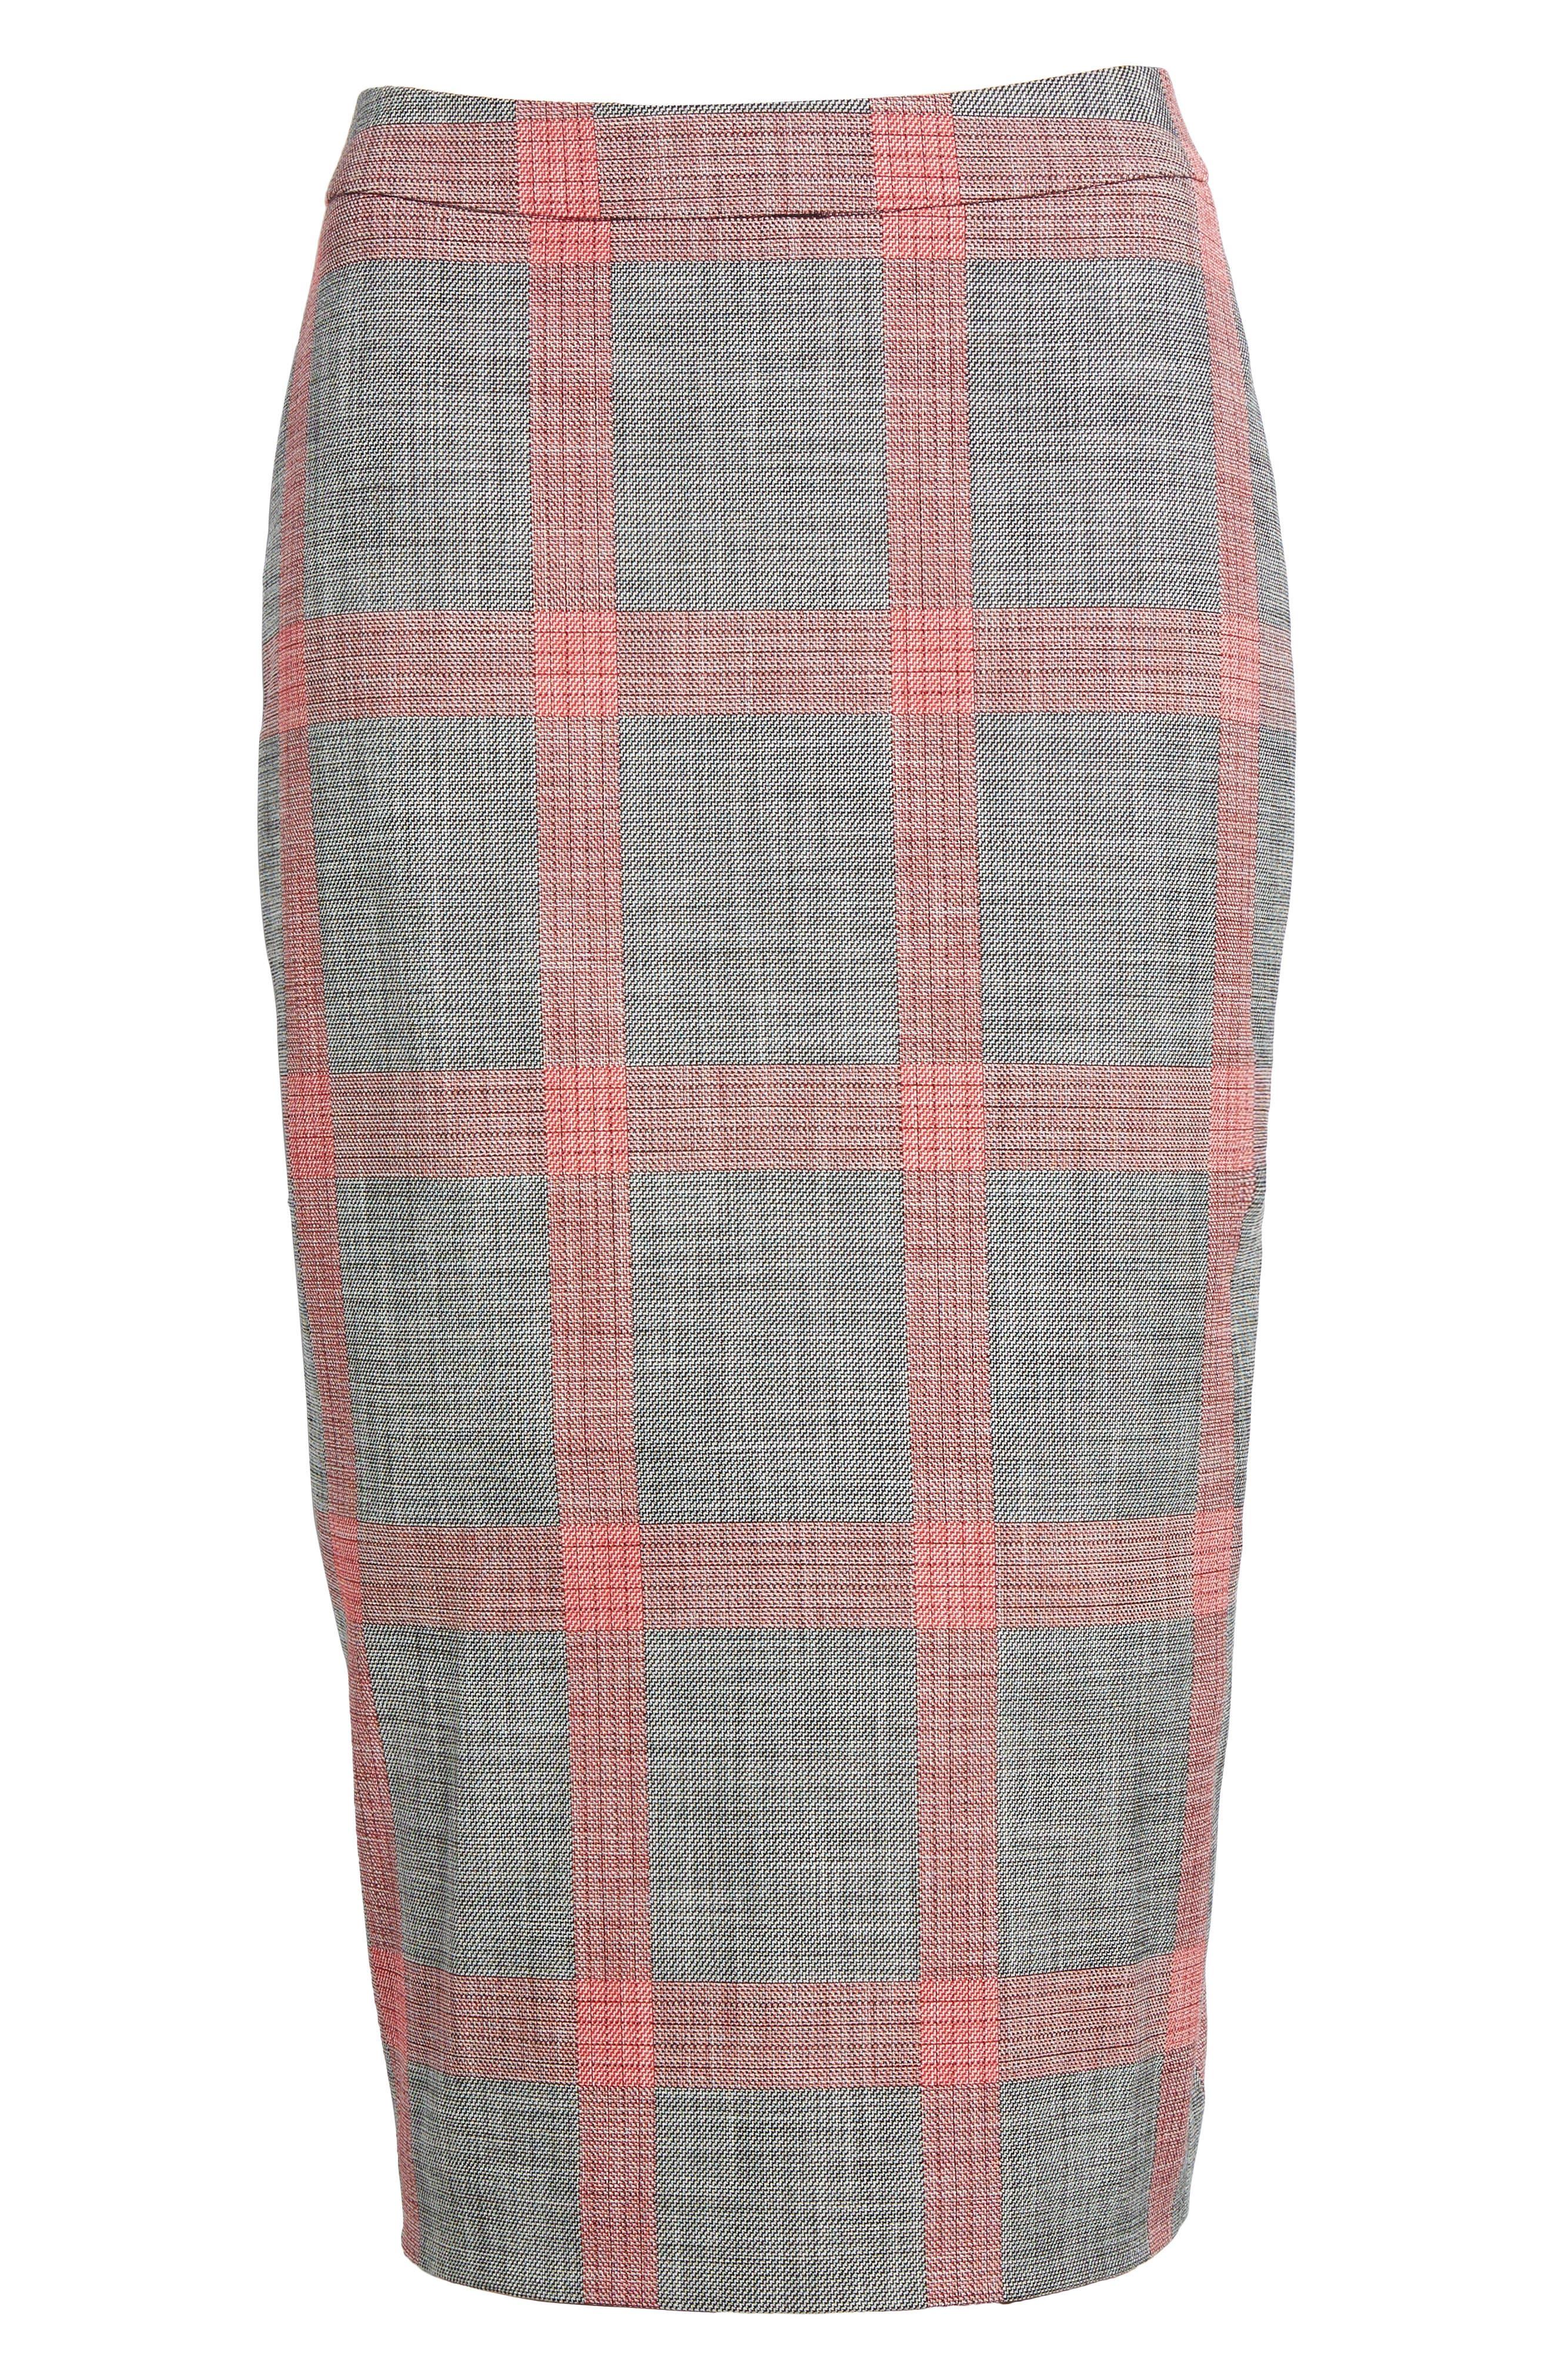 Plaid Pencil Skirt,                             Alternate thumbnail 6, color,                             001